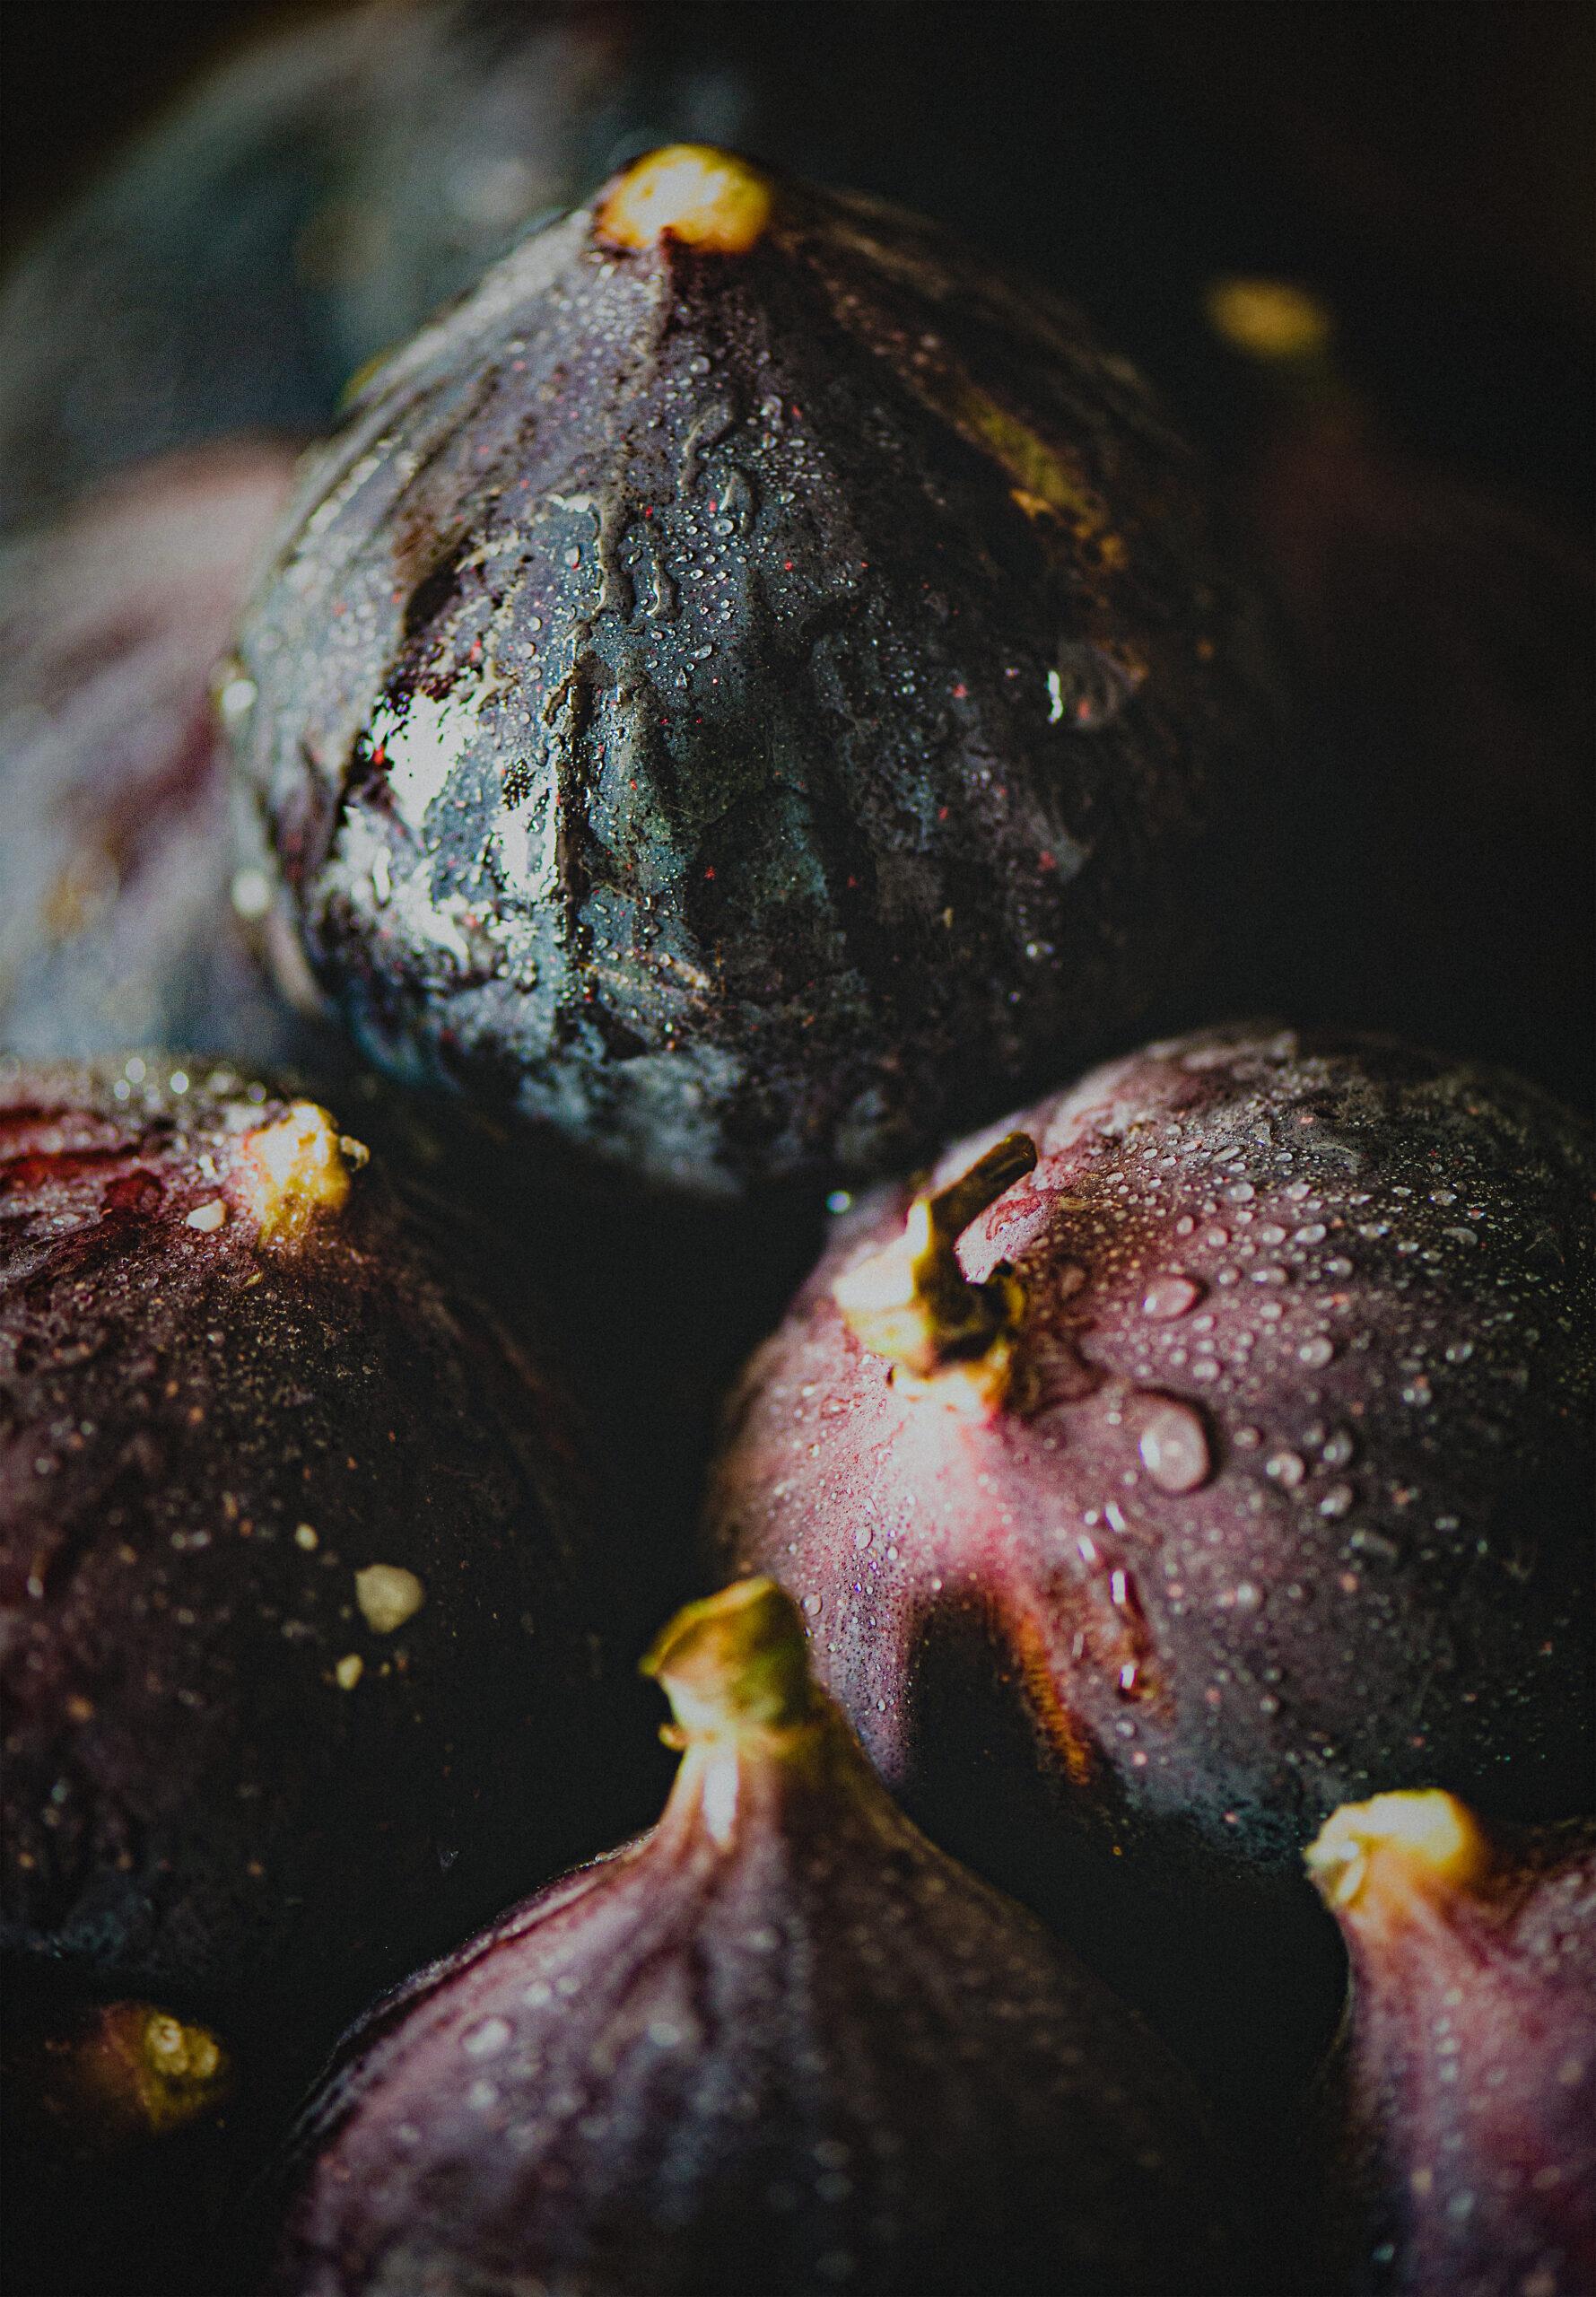 Fresh ripe seasonal harvested wet purple figs, selective focus, close-up